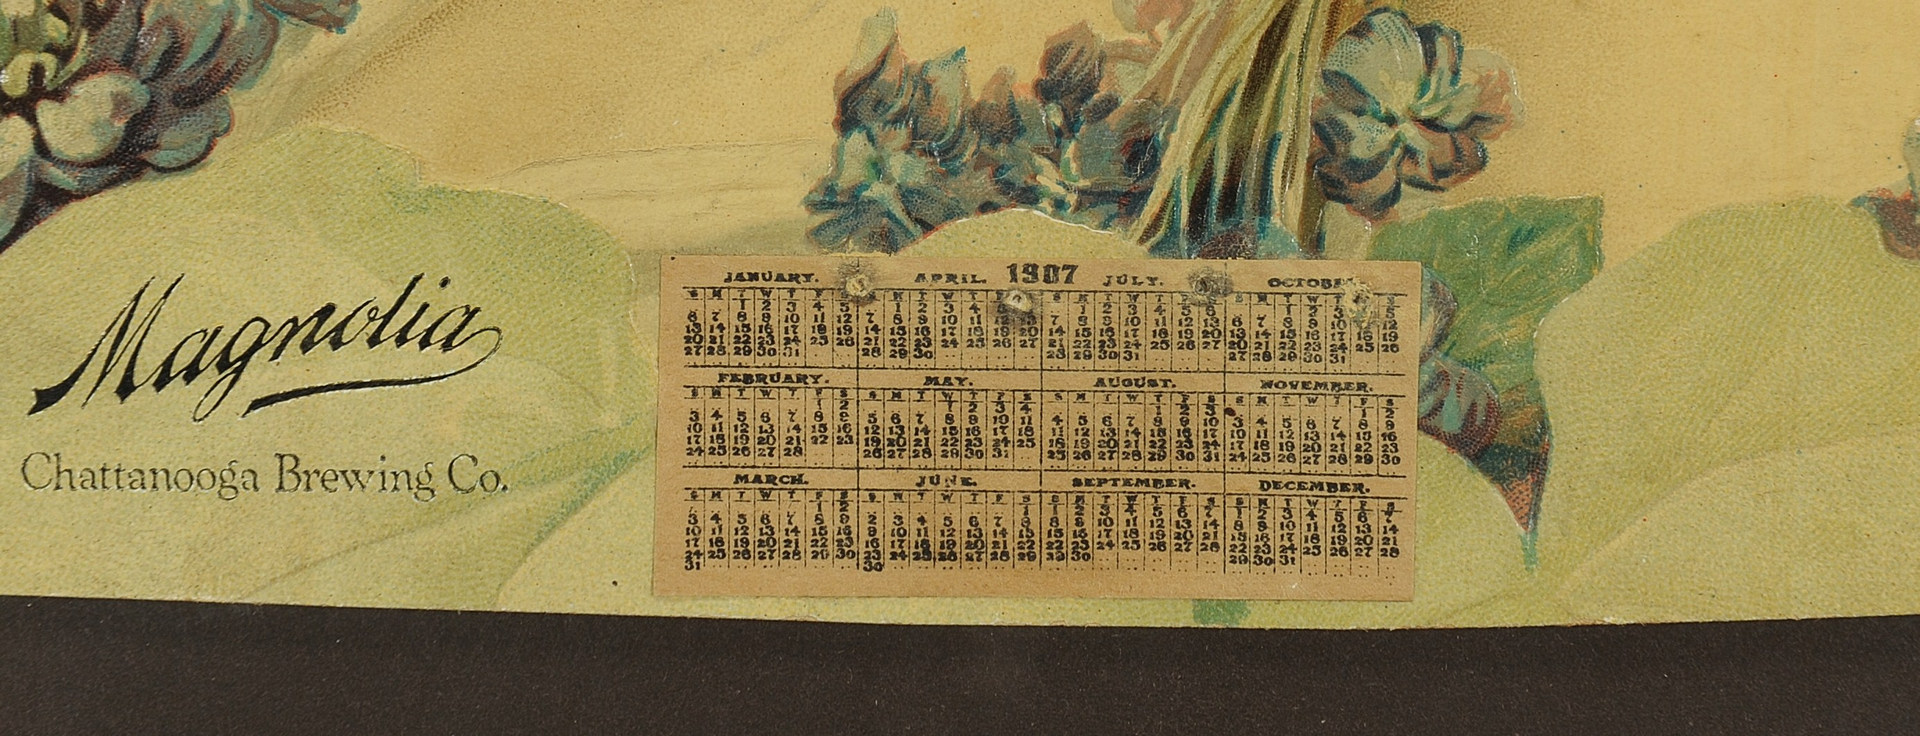 Lot 573: Framed 1907 Chattanooga Brewing Co. Calendar